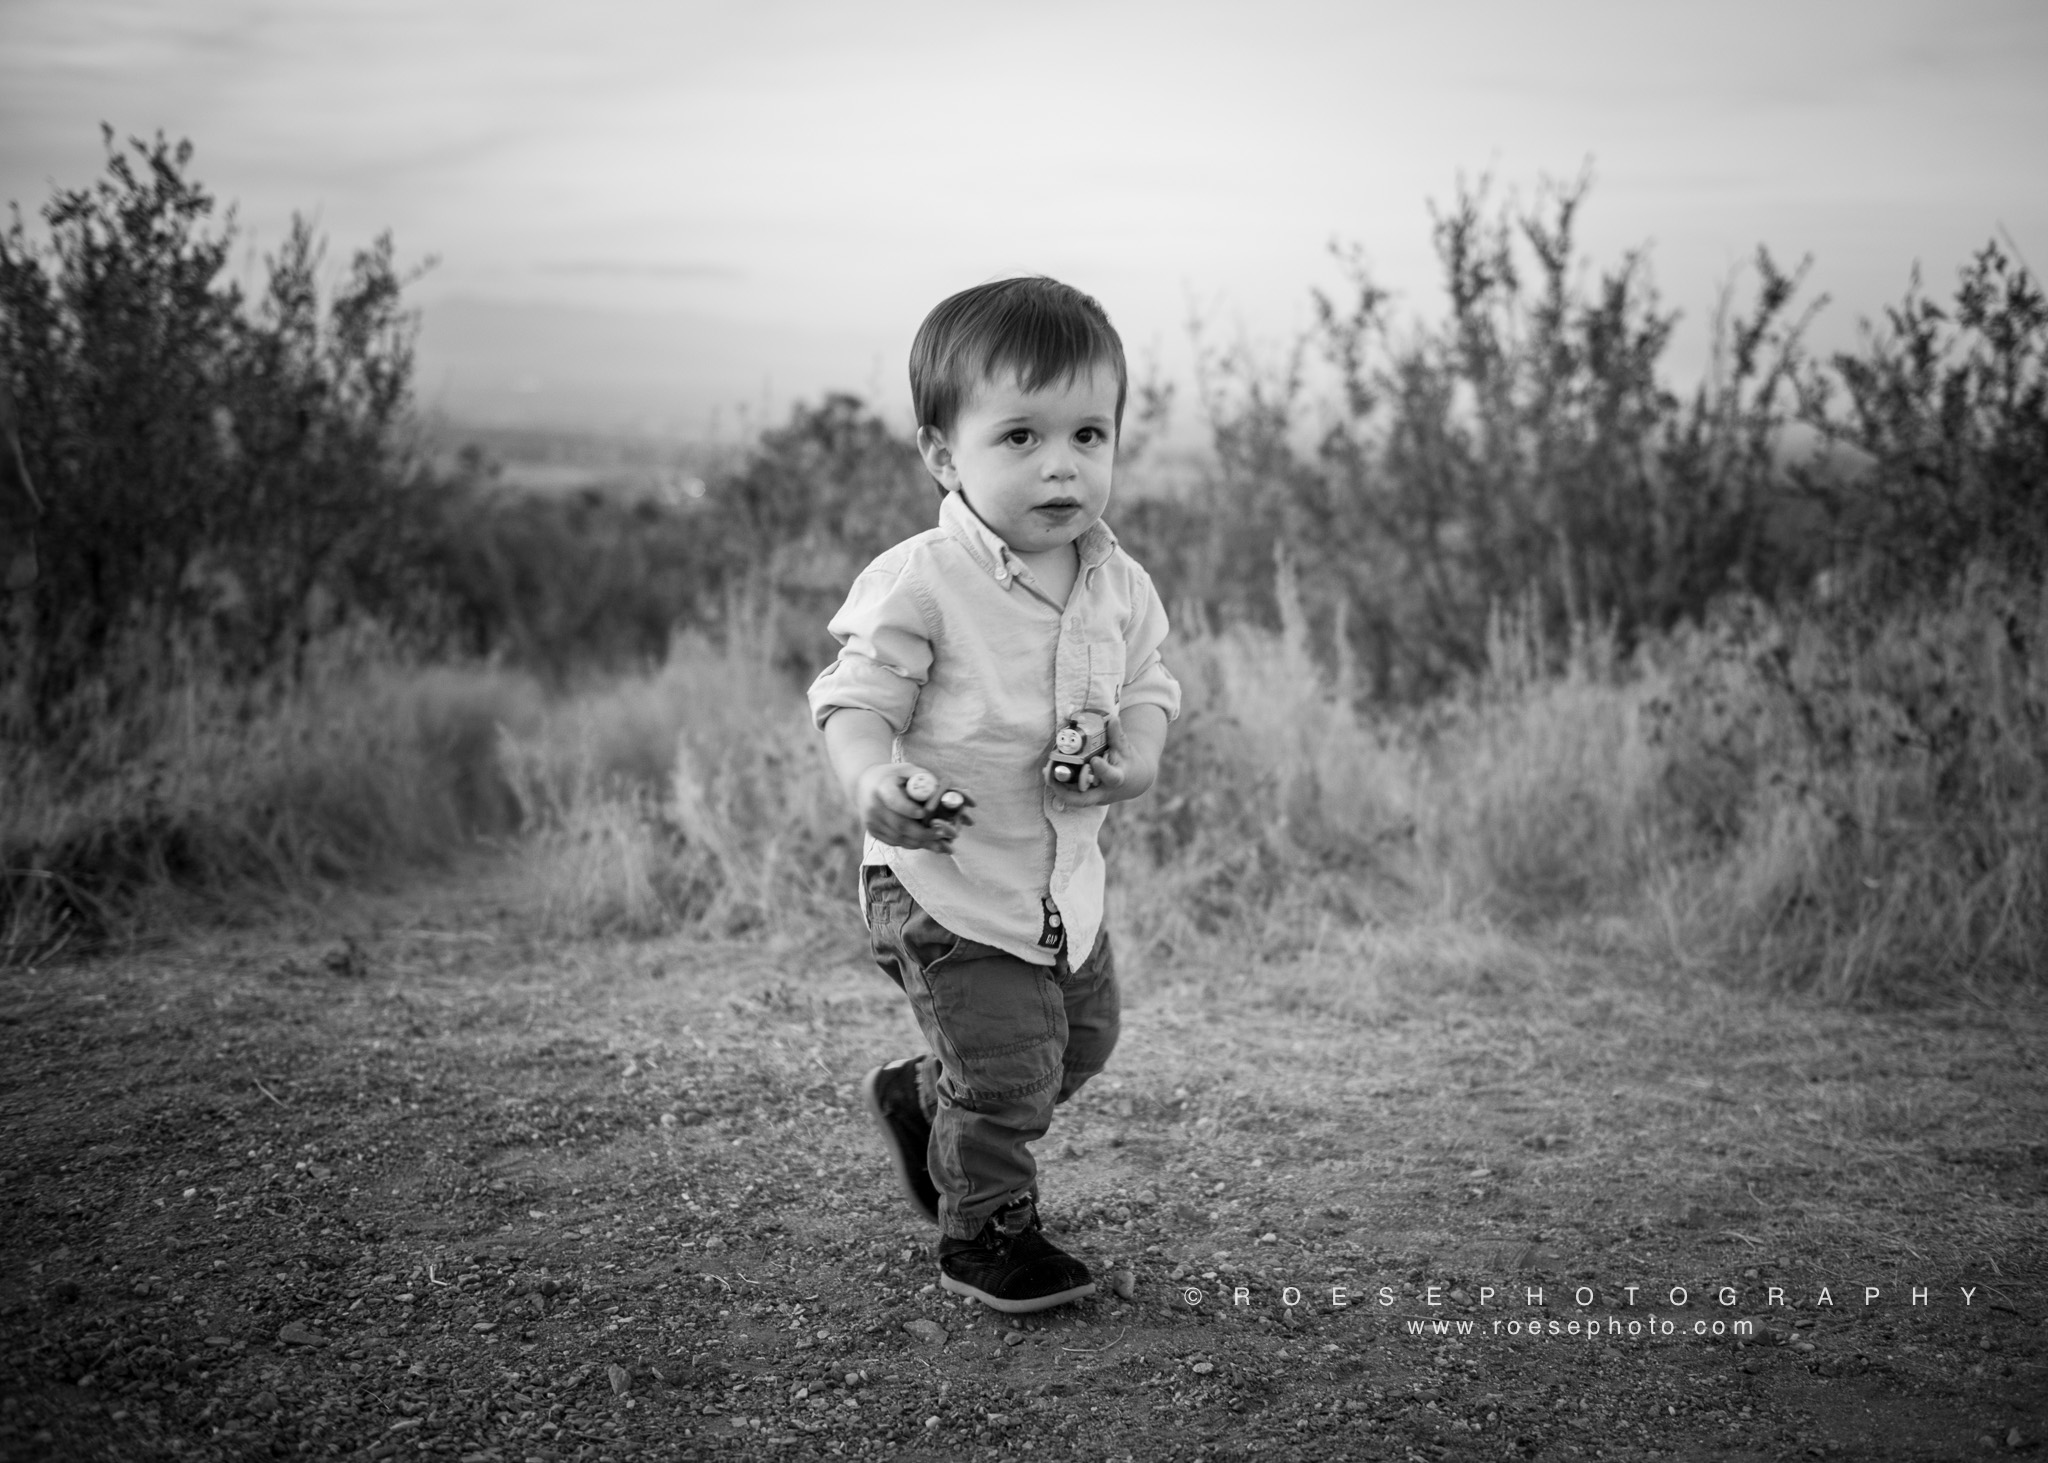 C.-Roese-Ramp-Roese-Photography-LLC.-Bennett-Family-27.jpg